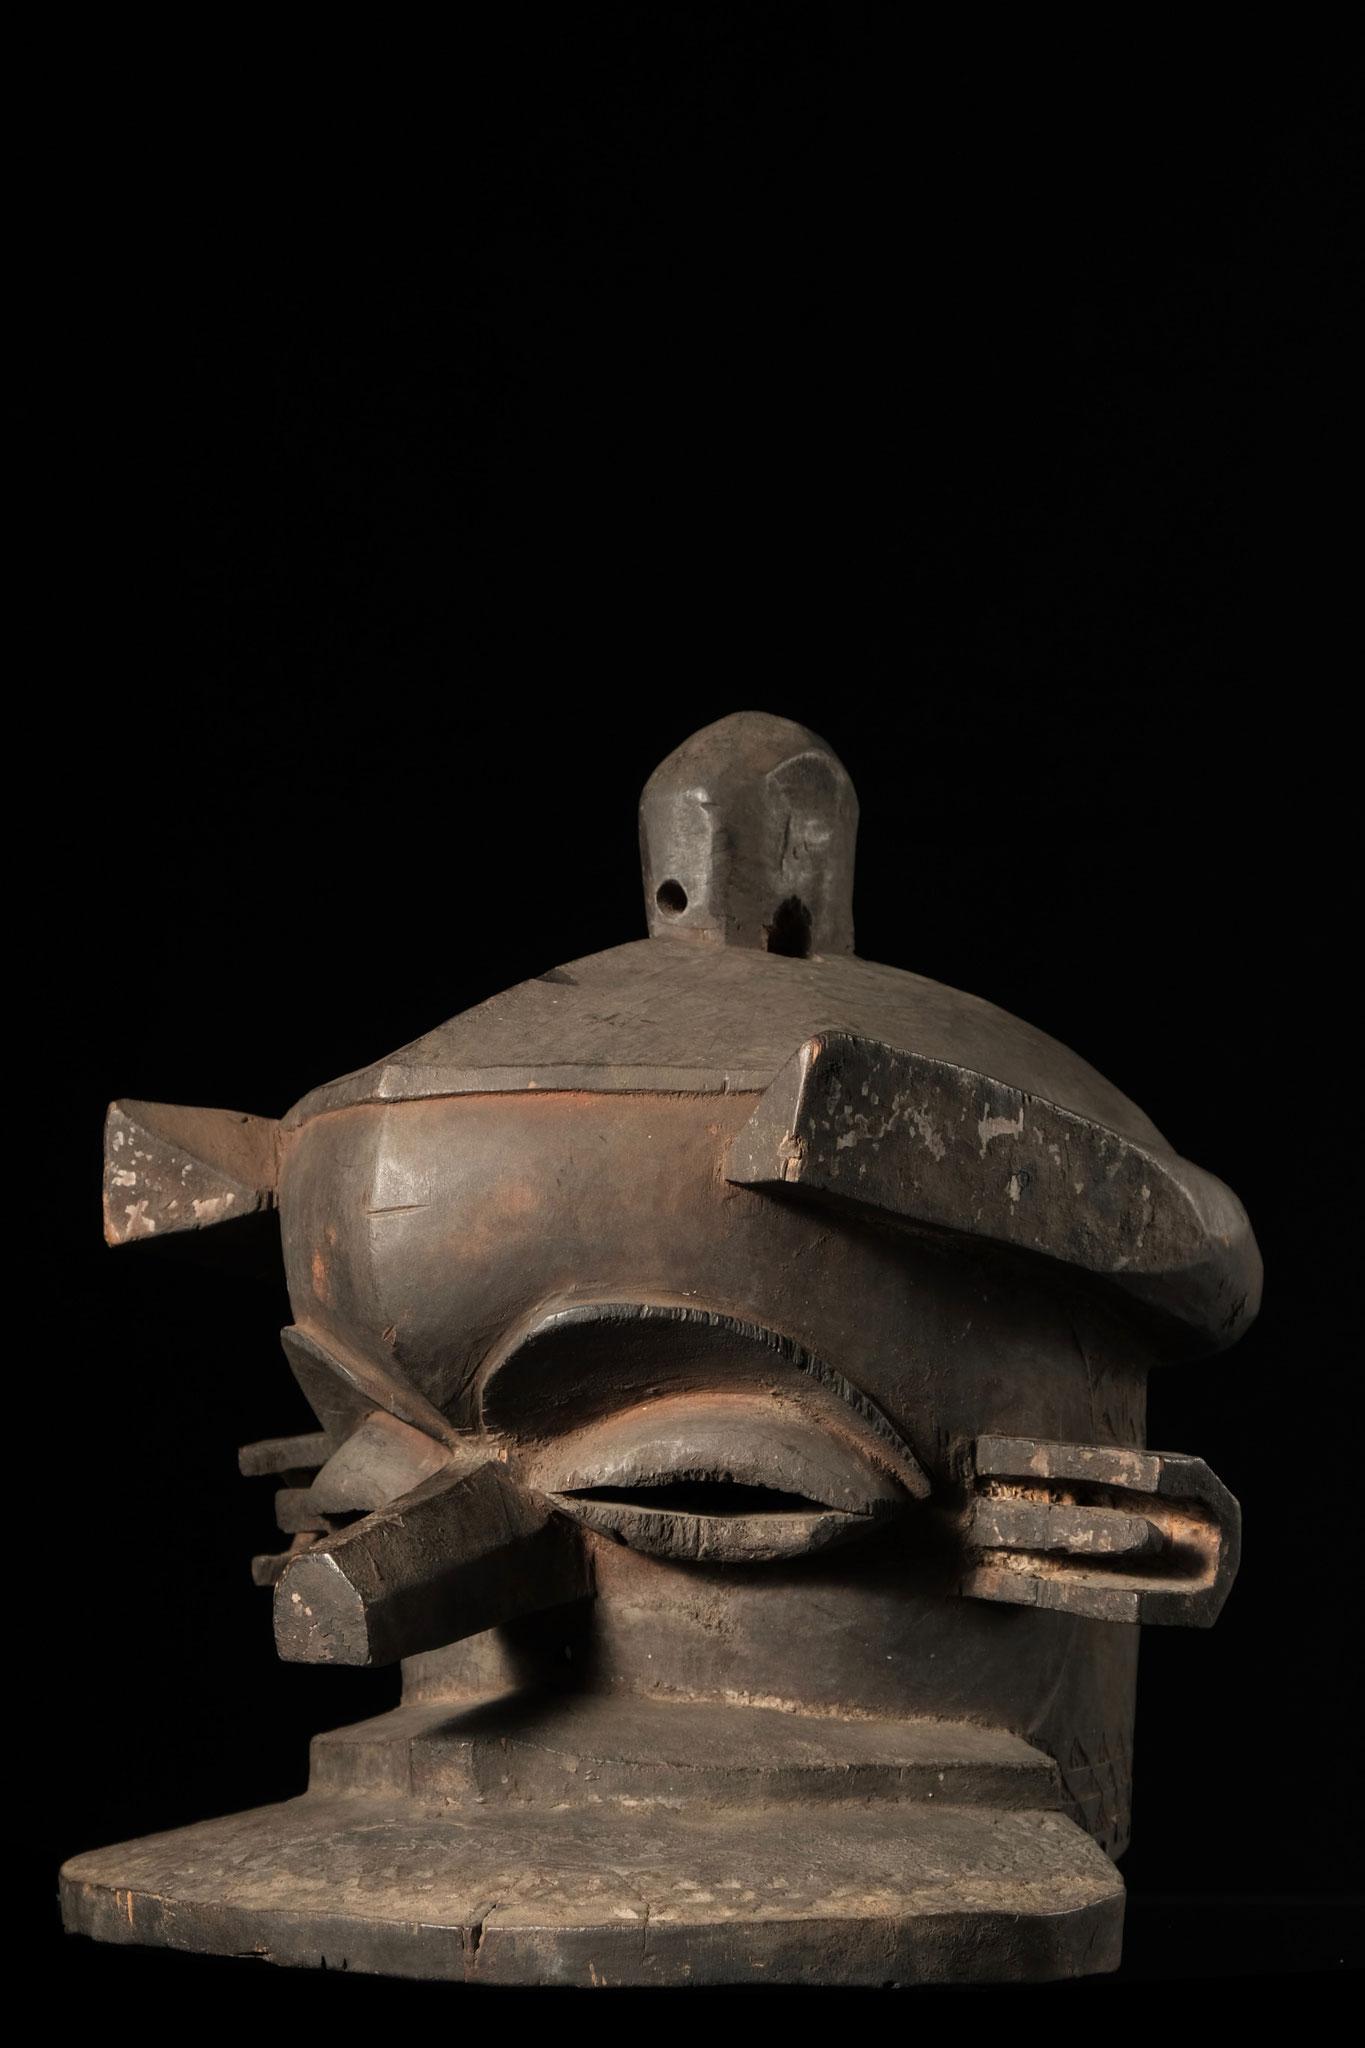 Giphogo-Mask, Pende, Congo, ex. Kegel-Konietzko